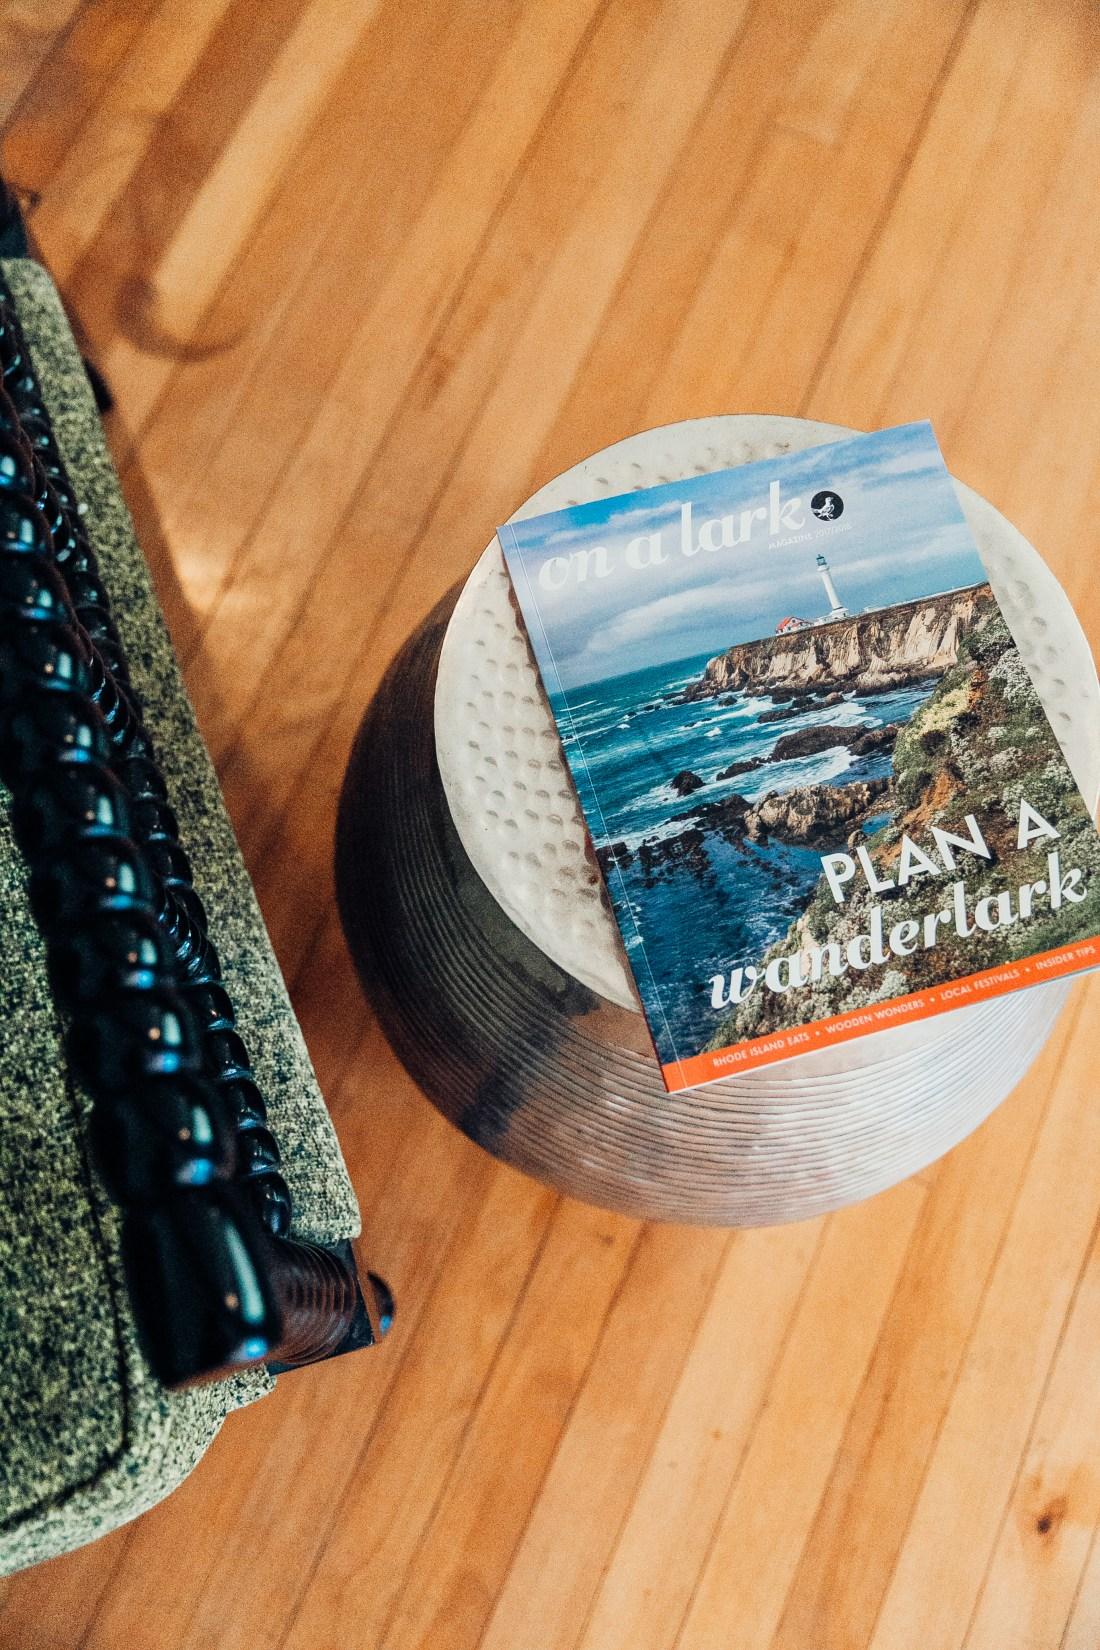 Where to Stay in Camden Maine | On a Lark –Lark Hotels | Whitehall Camden Maine | Best Hotels in Camden Maine | Best Hotels in Maine | Where to Stay in Maine | Travel Diary from writer + photographer @elanaloo + elanaloo.com